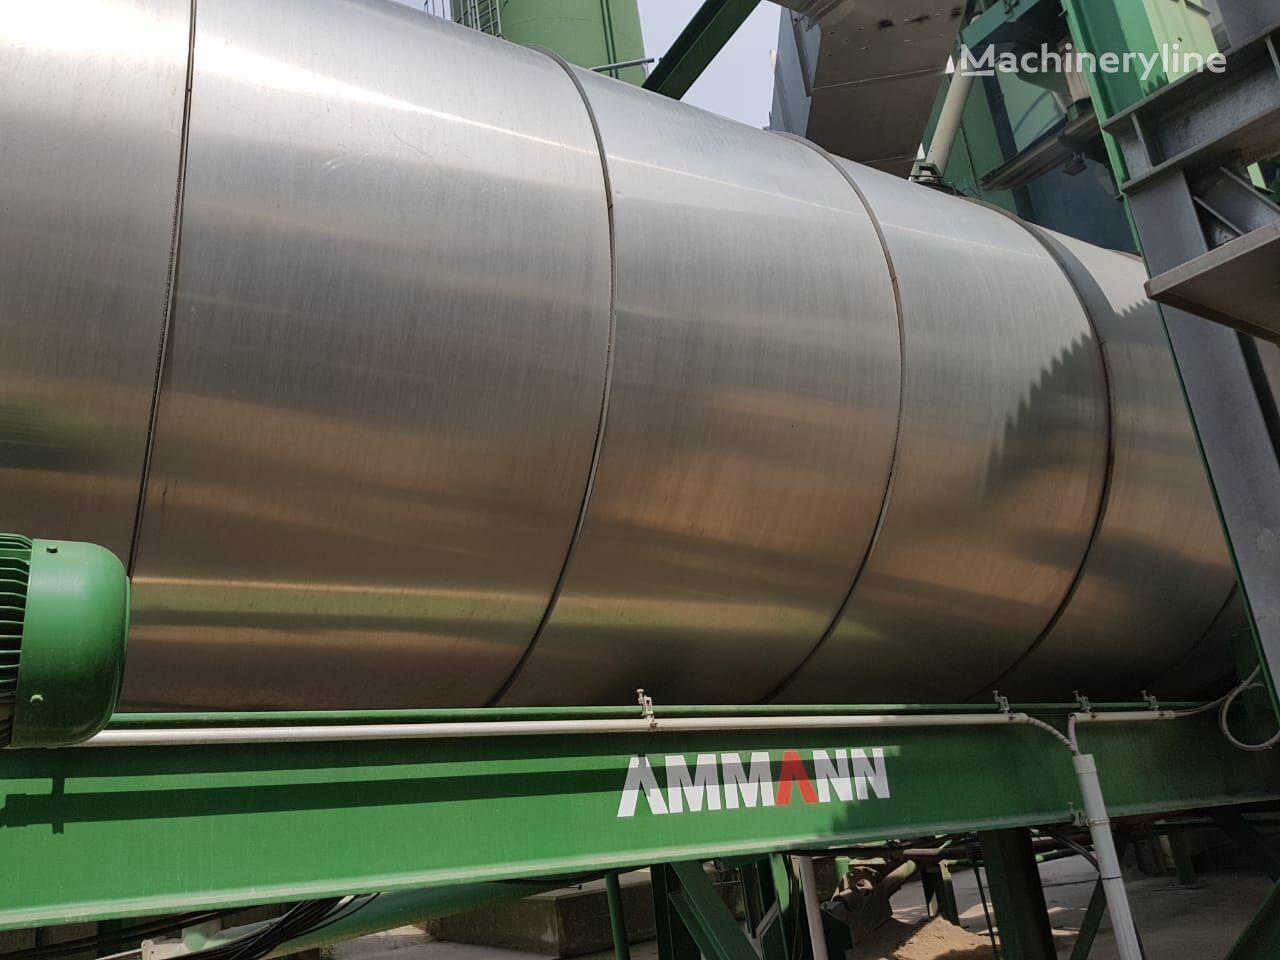 AMMANN 160 tph asphalt plant